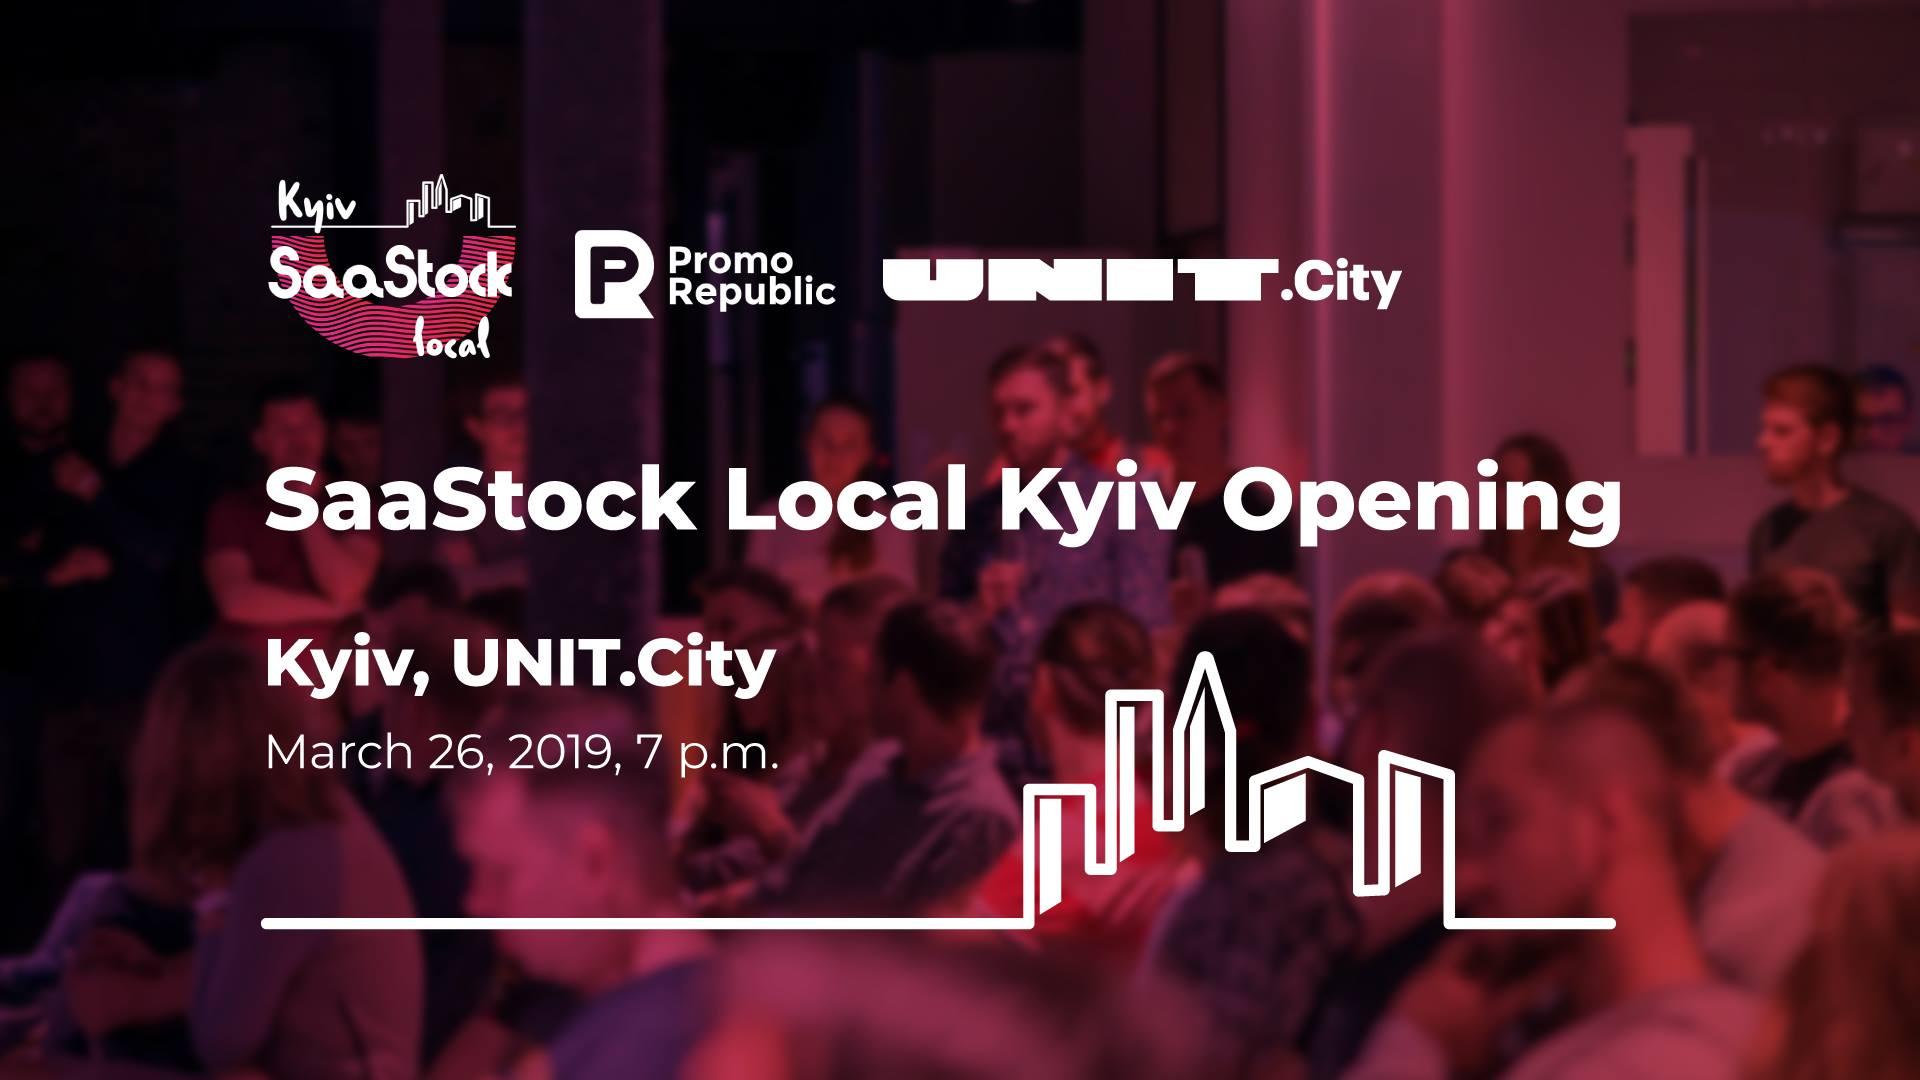 SaaStock v UNIT.City: masštabna biznes-konferencija vperše vidbudeťsja v Ukraїni